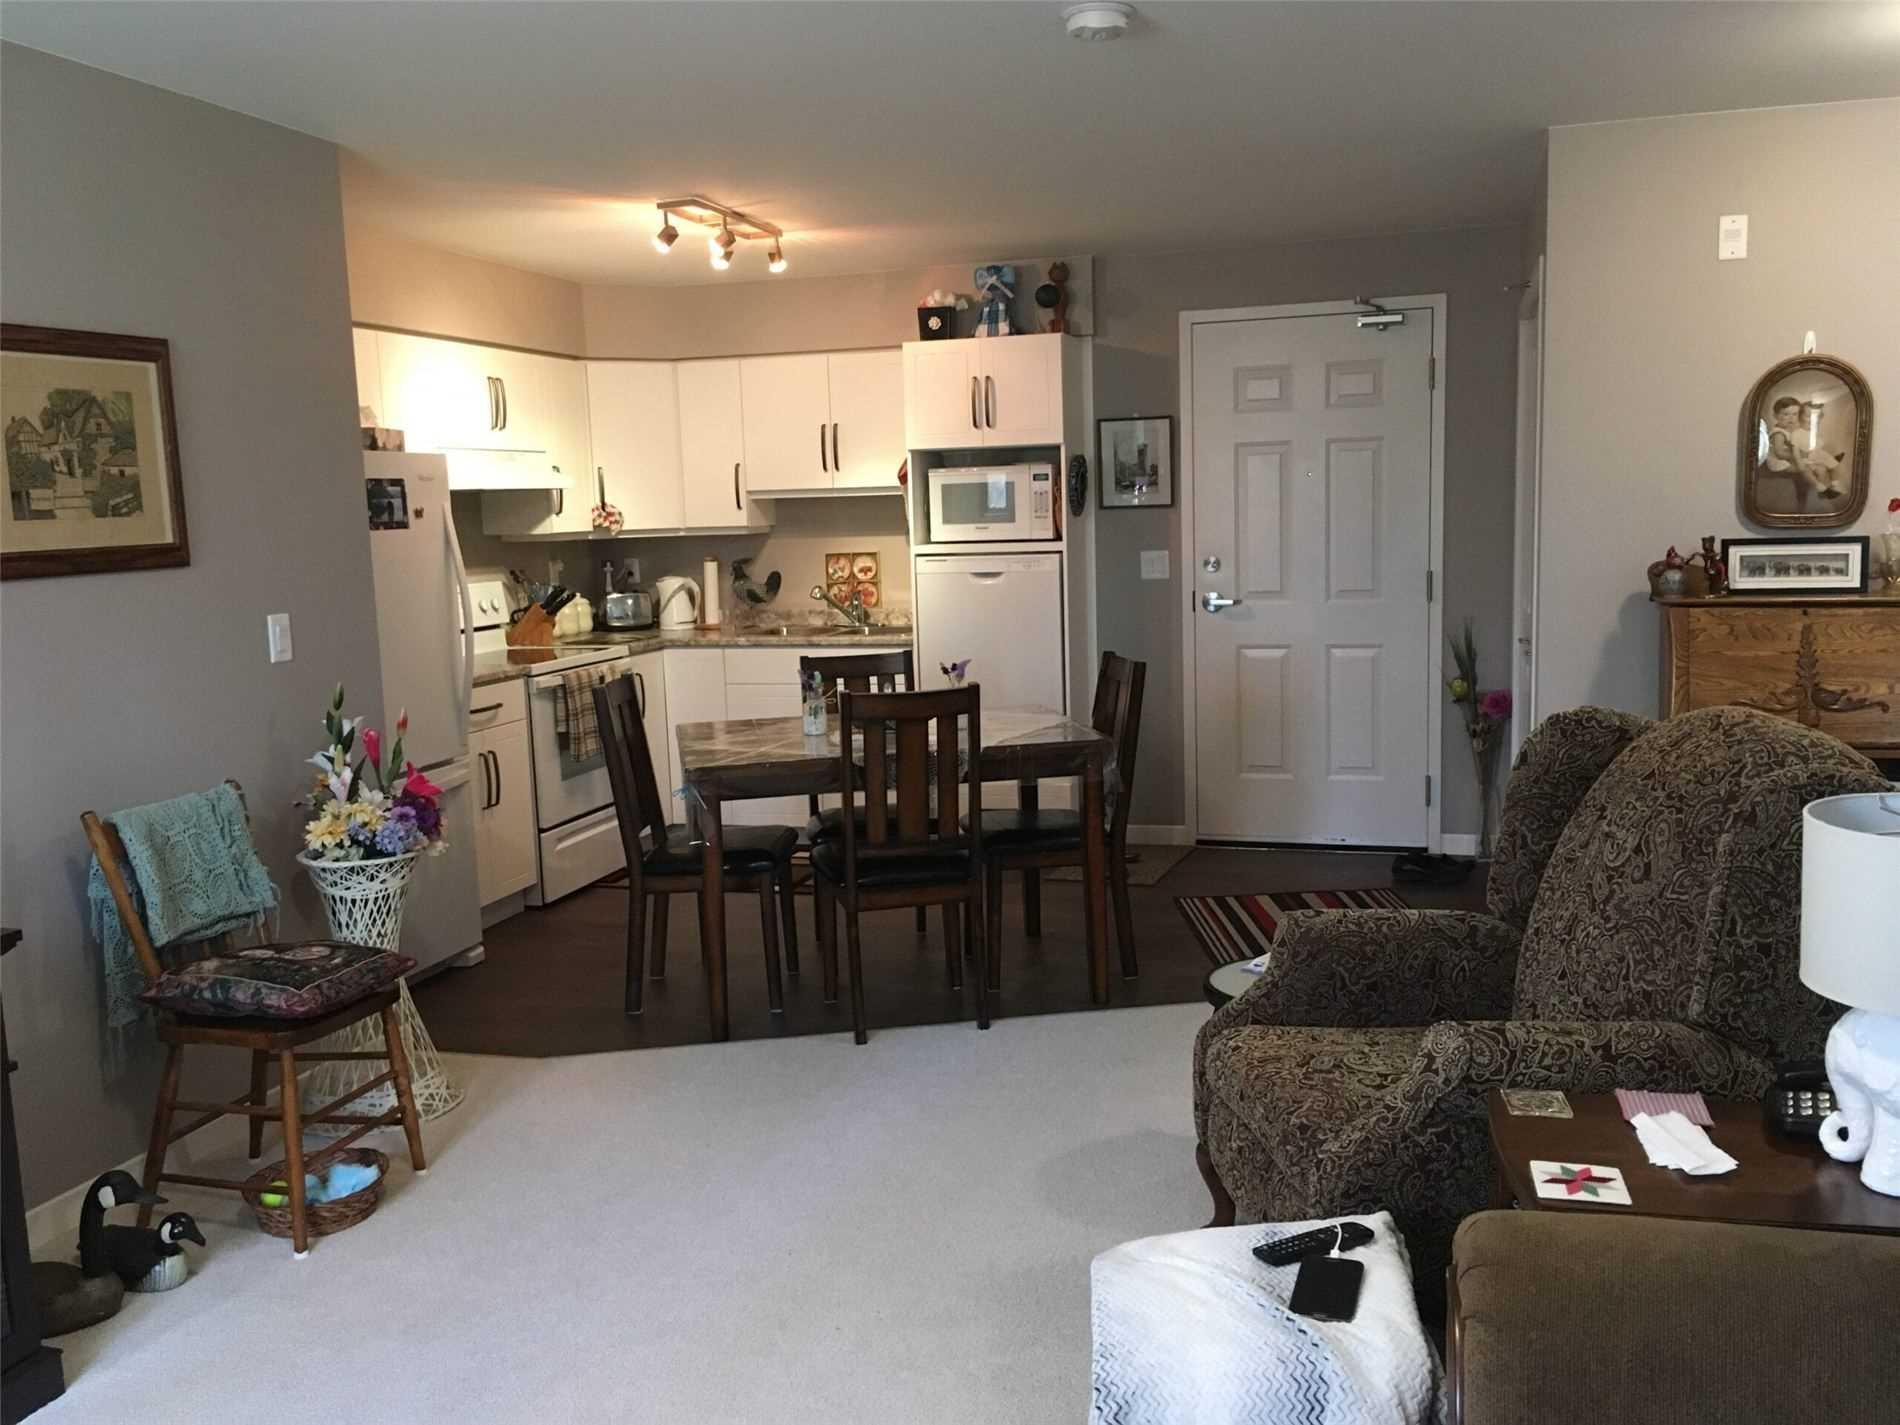 850 Alpha St, Owen Sound, Ontario N4K5W8, 1 Bedroom Bedrooms, ,1 BathroomBathrooms,Condo Apt,For Sale,Alpha,X5113362